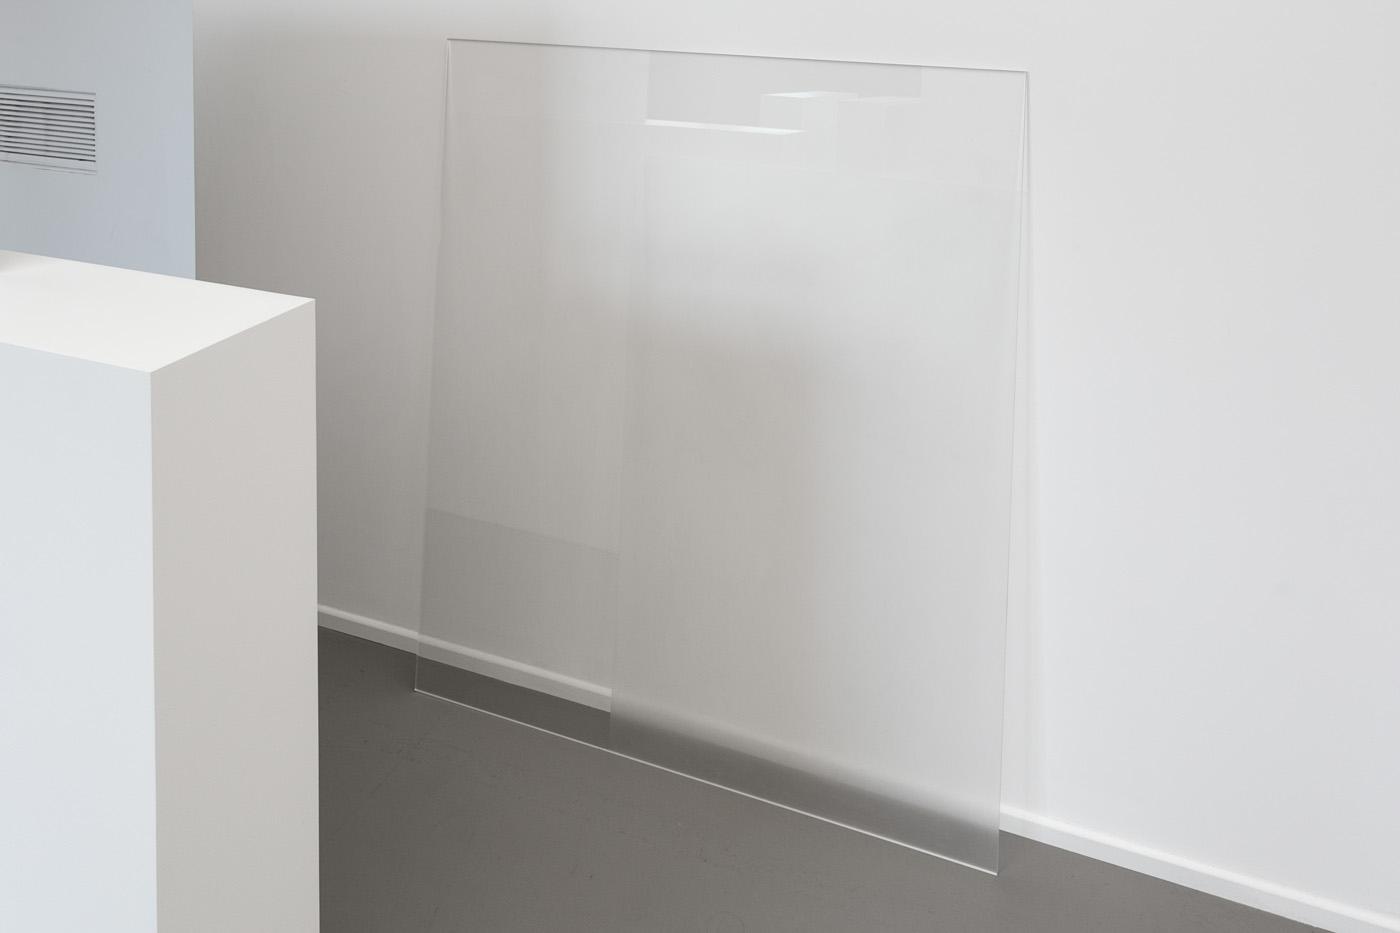 Meta / Meta Δ, 2014 - Installation, bois peint, adhésif, plexiglas